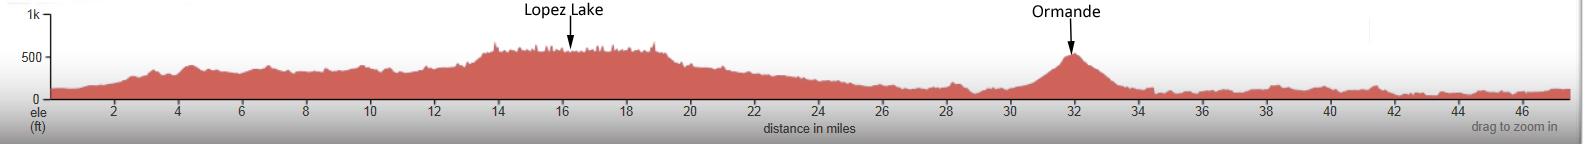 Lopez-Lake-Pismo-elevation-profile